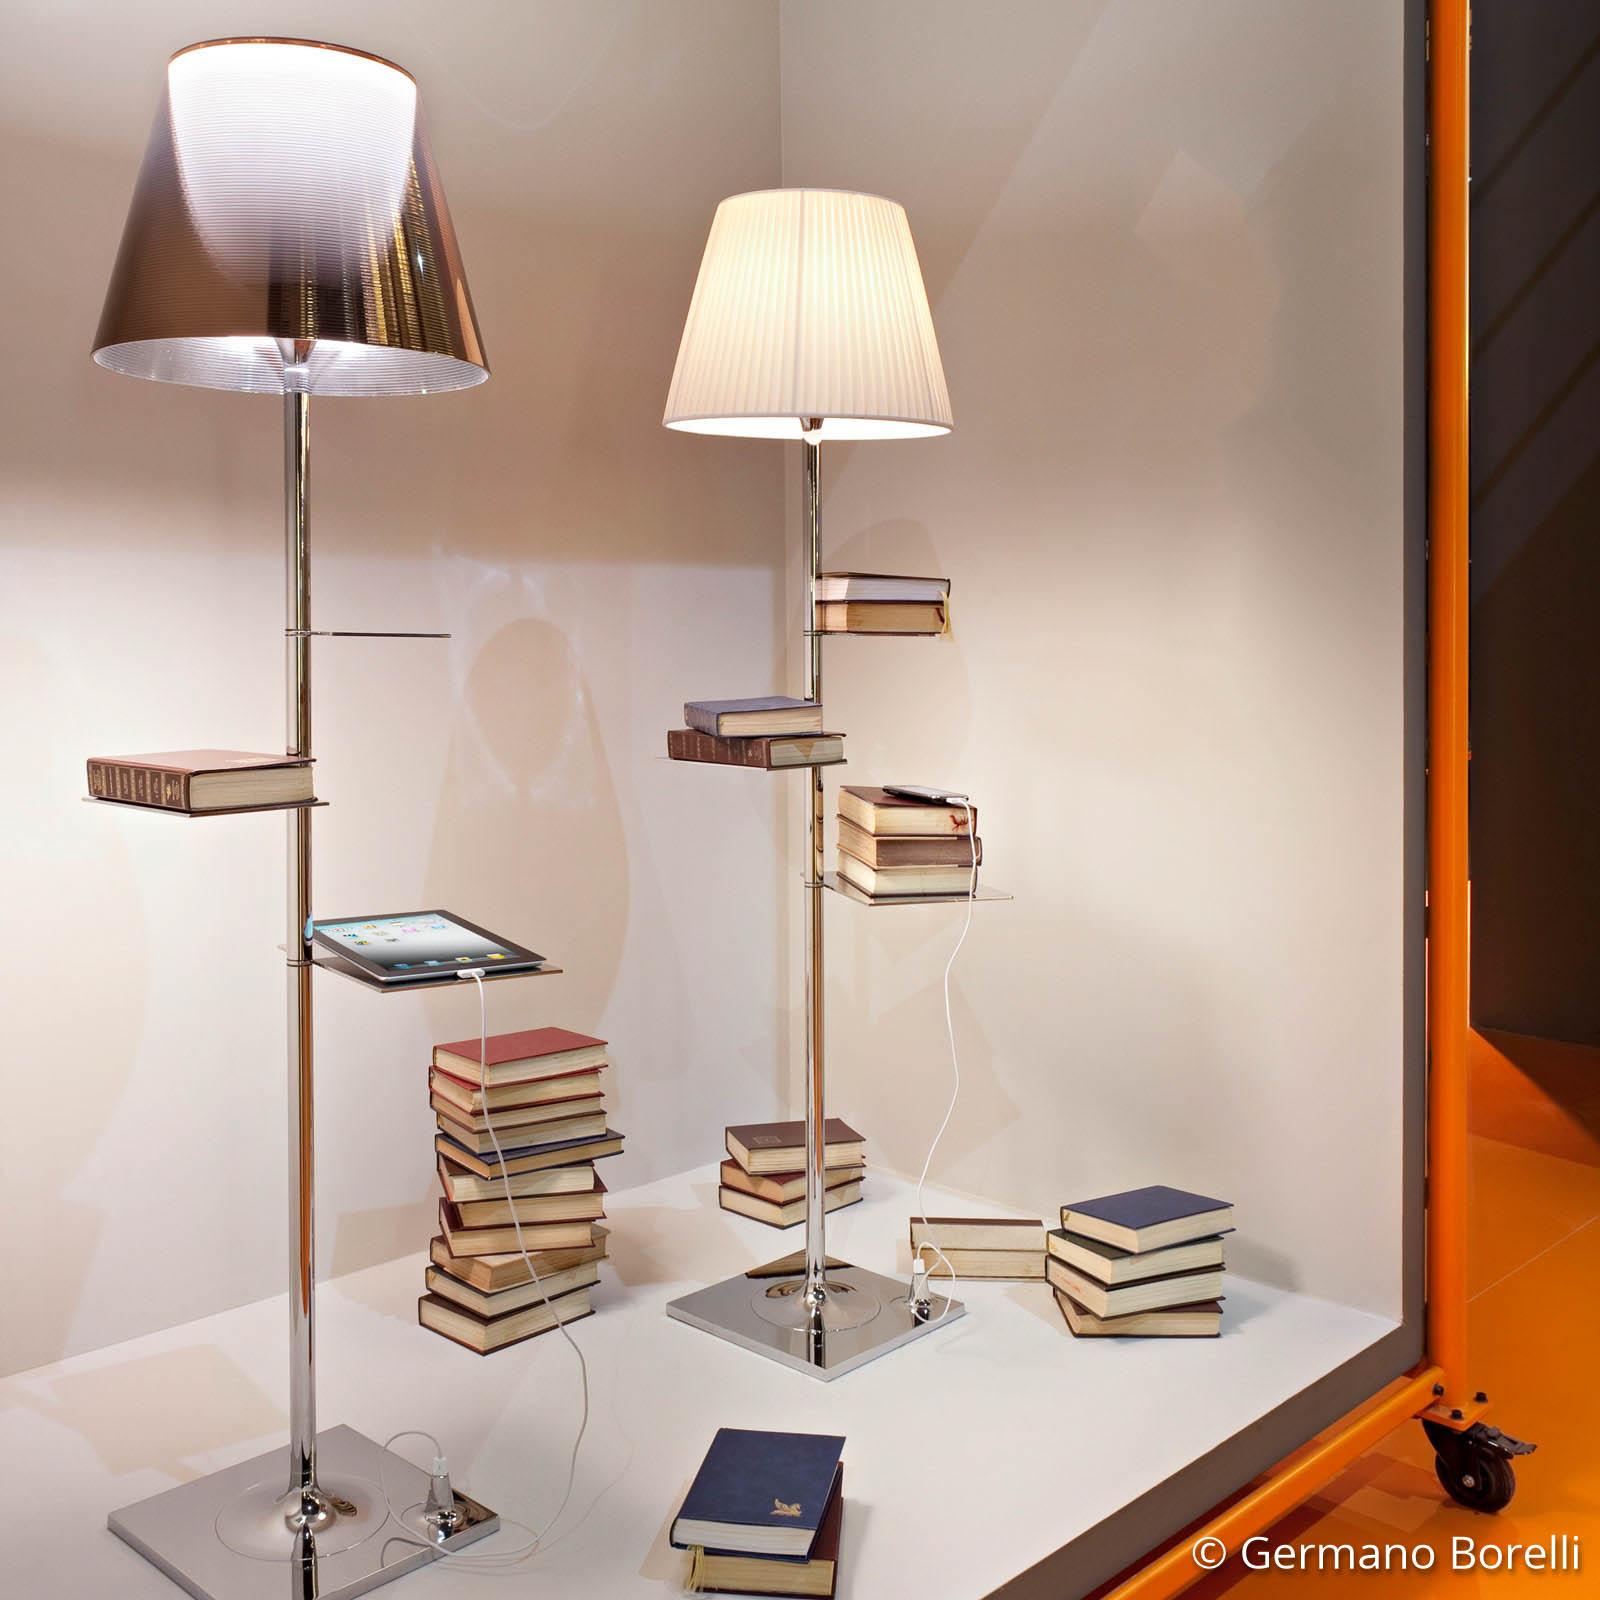 FLOS Bibliotheque Nationale Stehlampe bronze